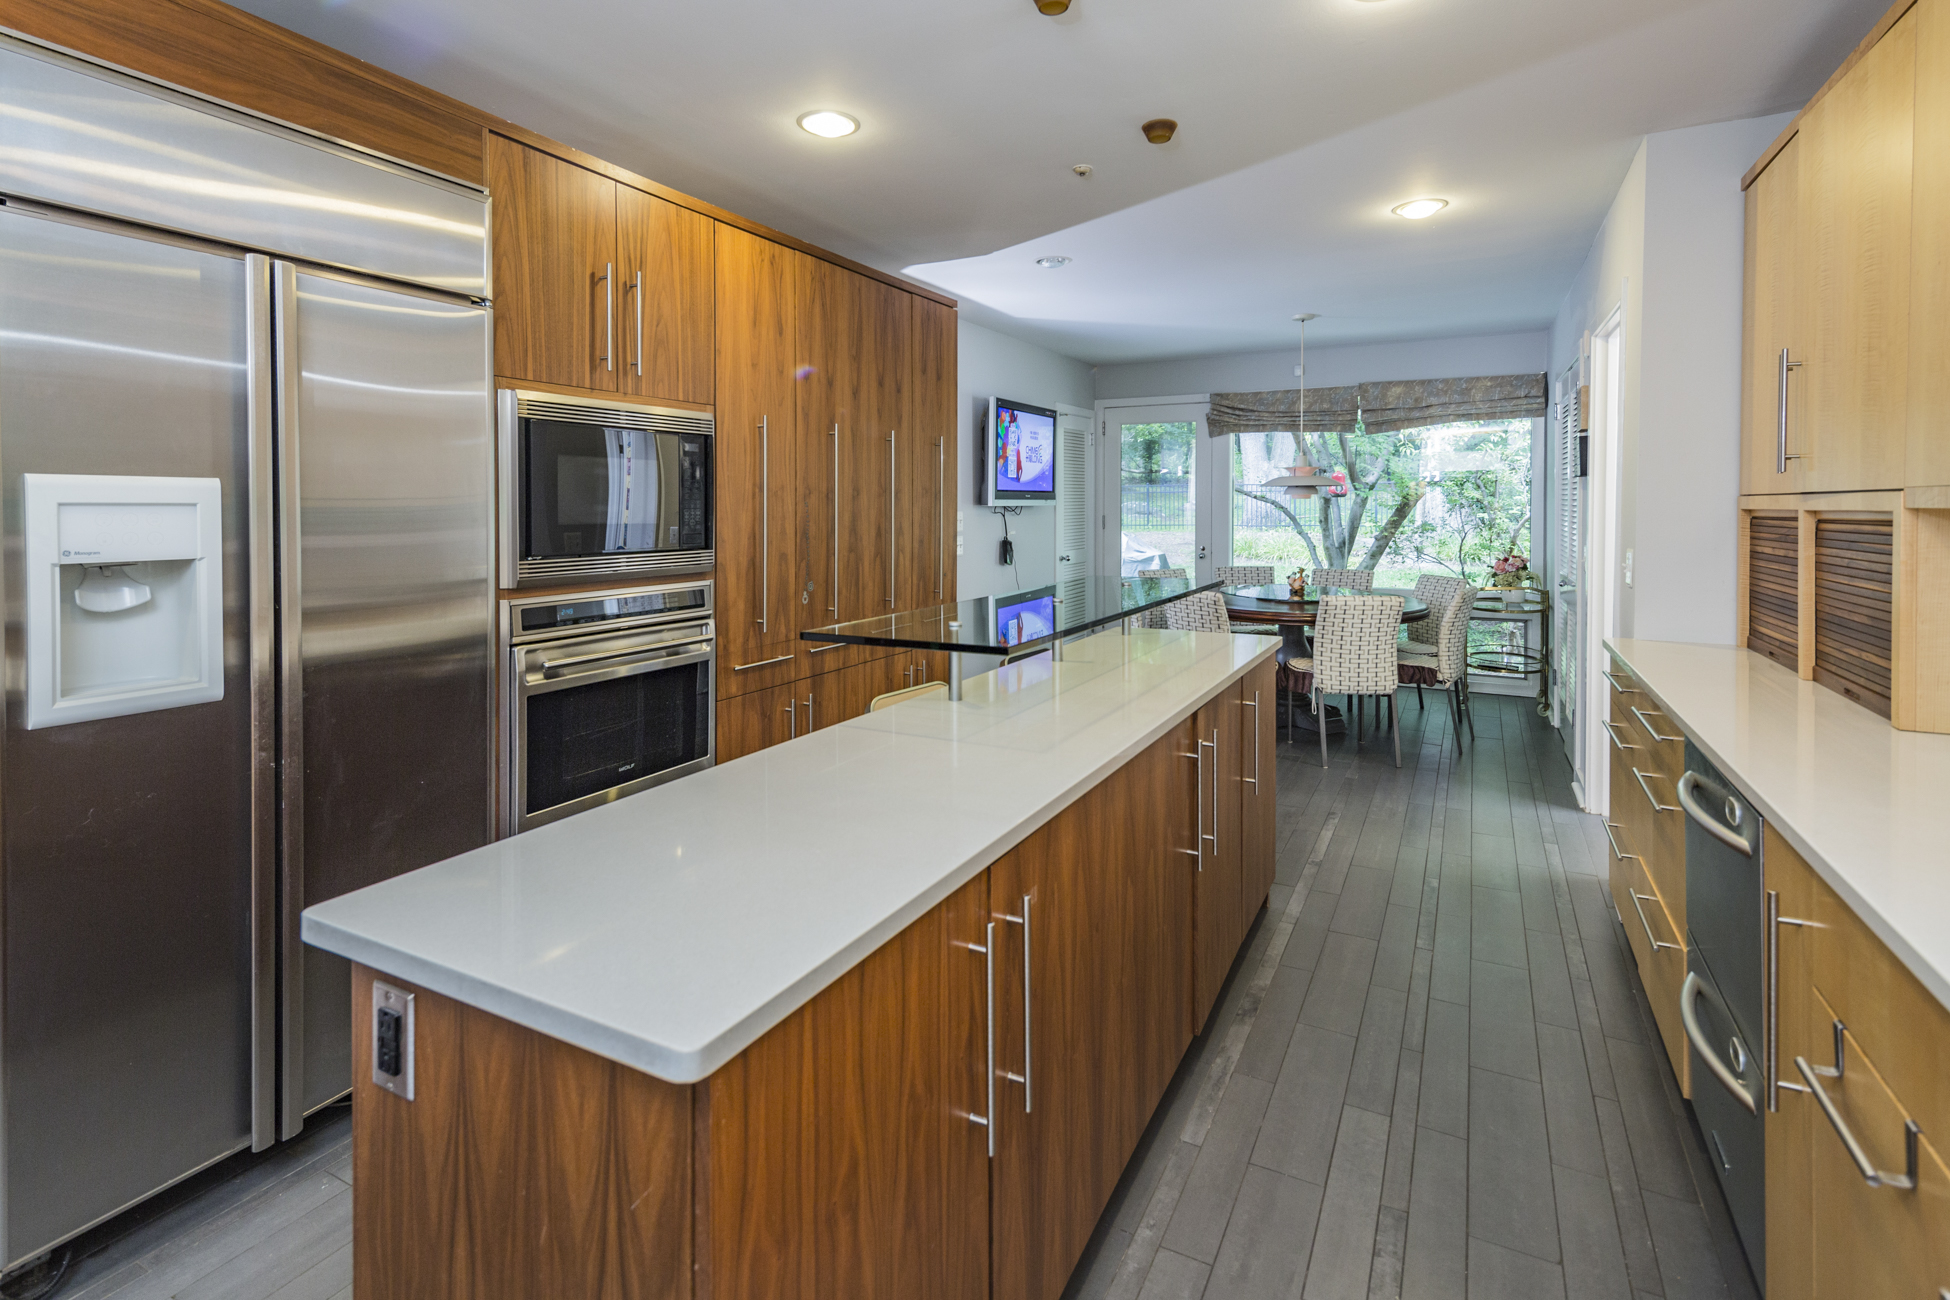 Additional photo for property listing at Impressive Space in Modern Princeton Home 1147 Stuart Road Princeton, Нью-Джерси 08540 Соединенные Штаты